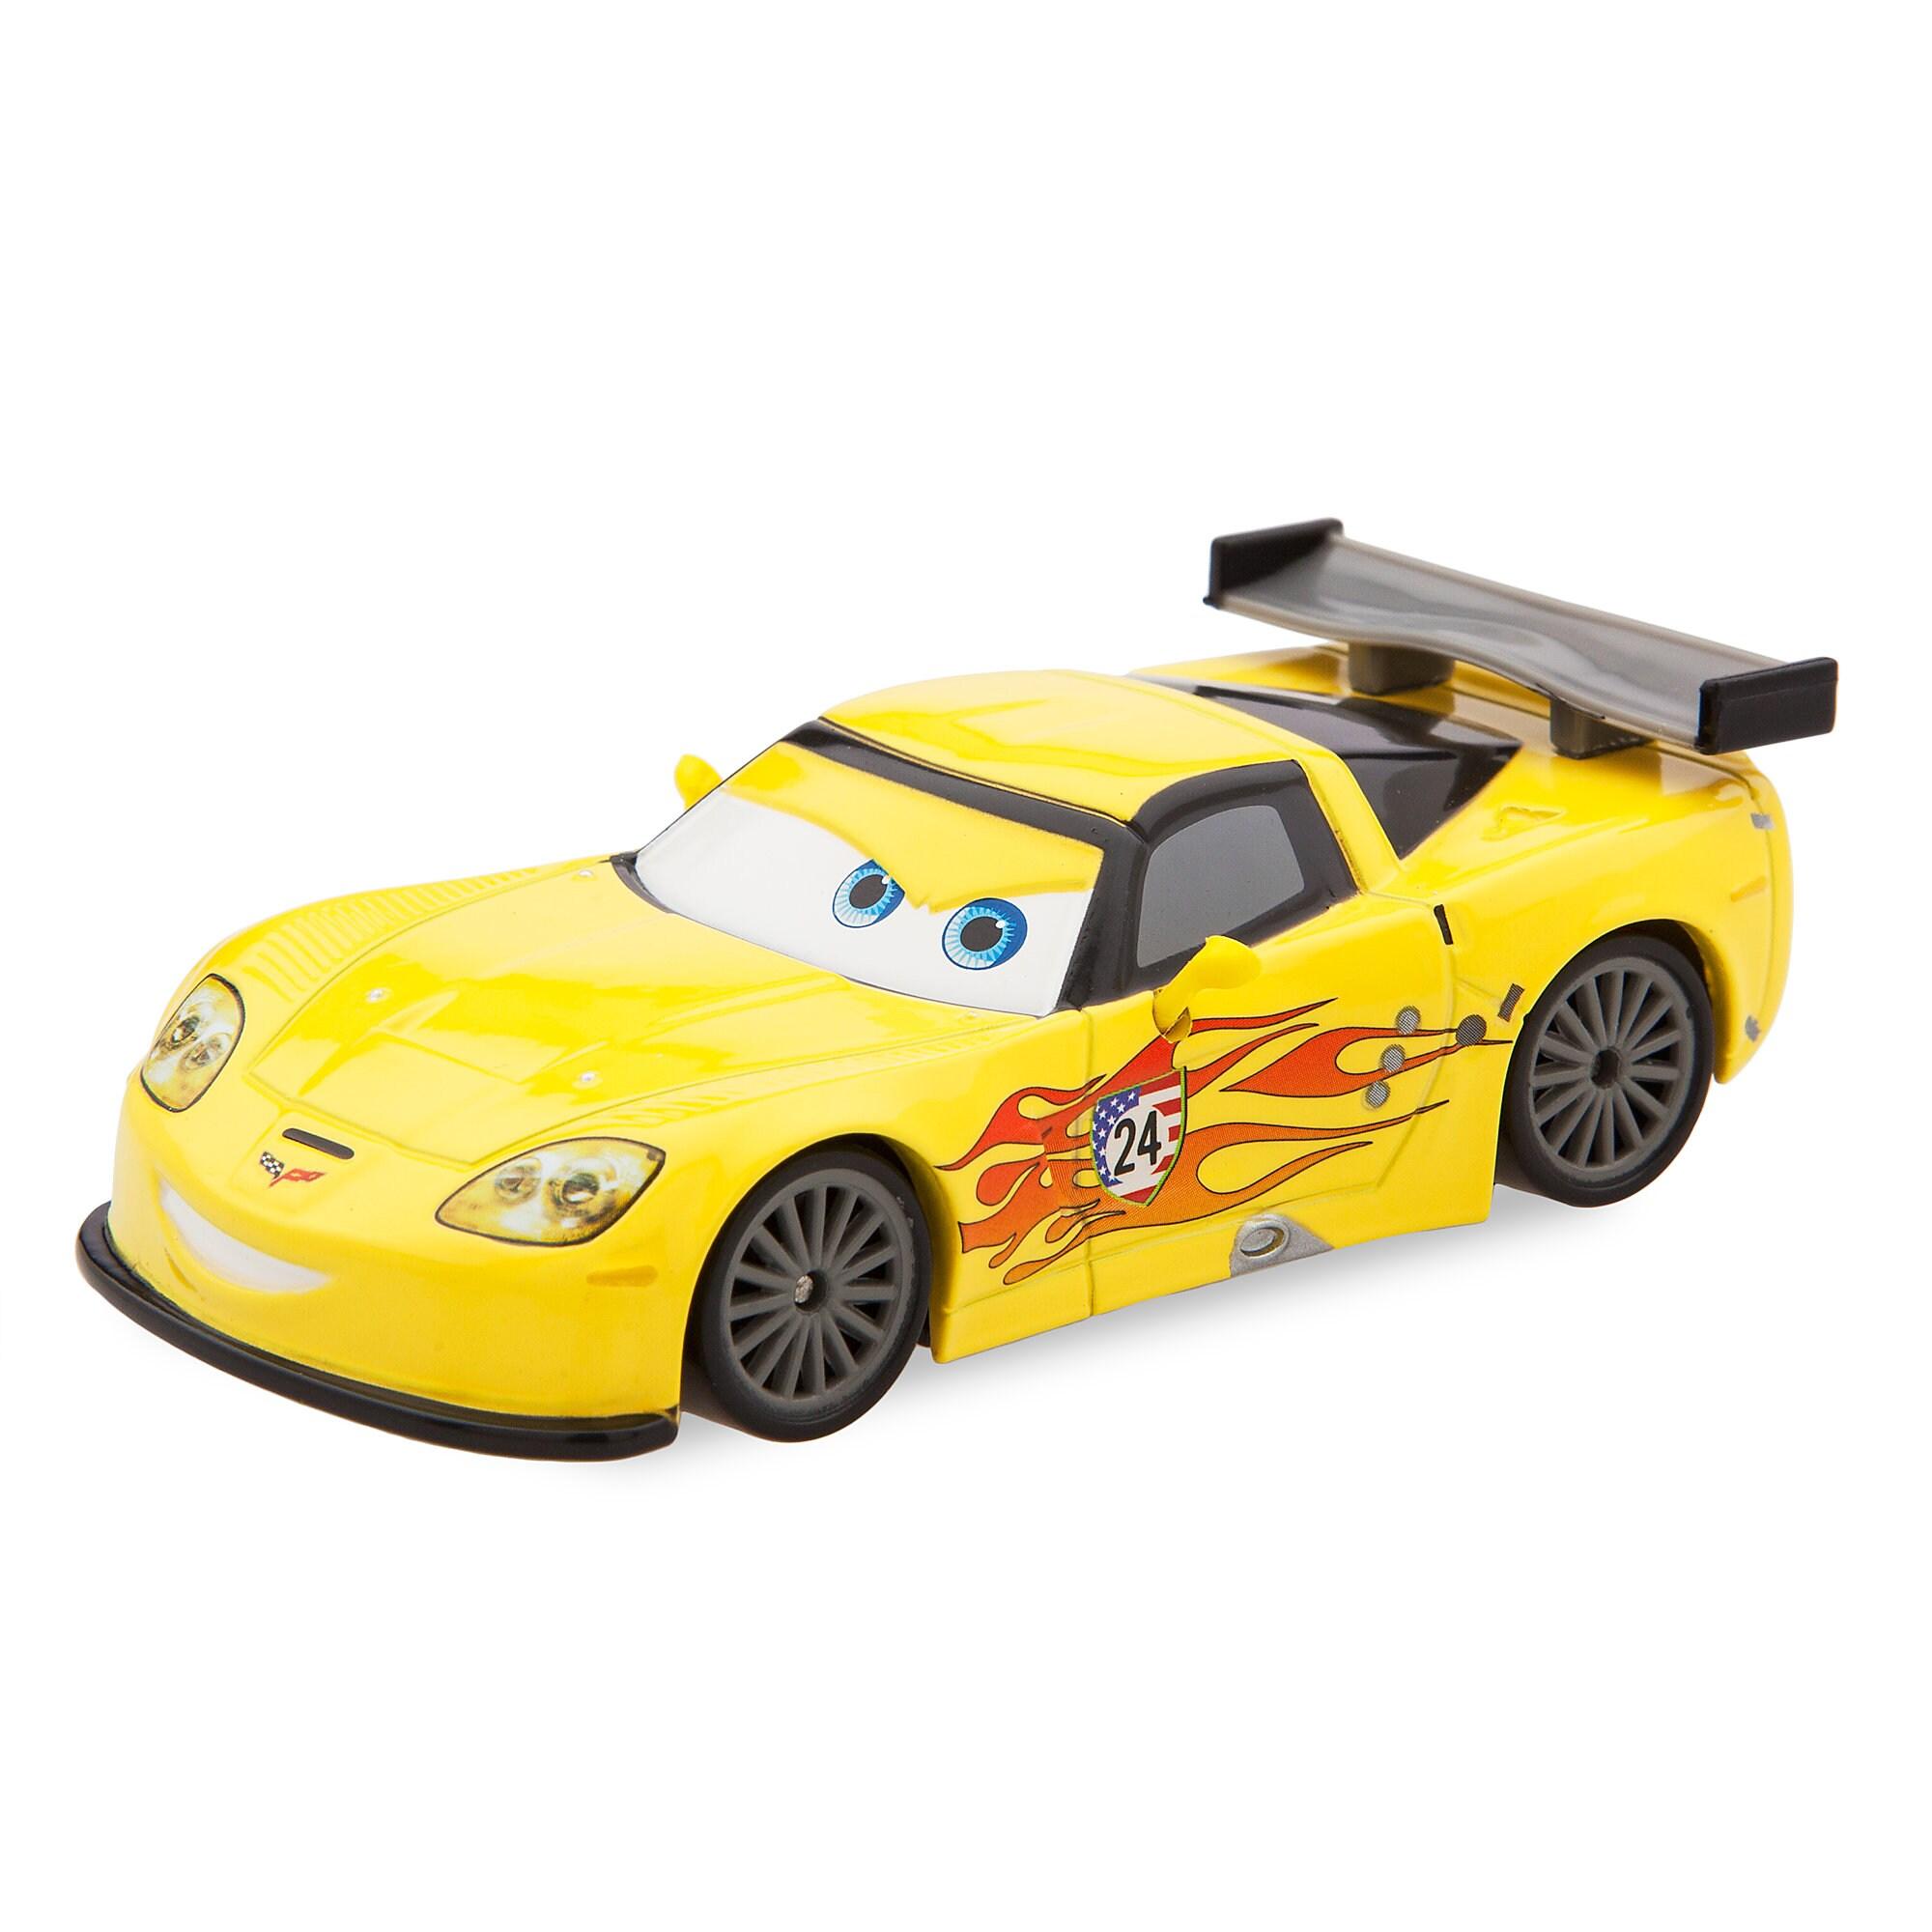 Cars 3 Cast Deutsch Disney Pixar Cars 3 Piston Cup Metal Die Cast